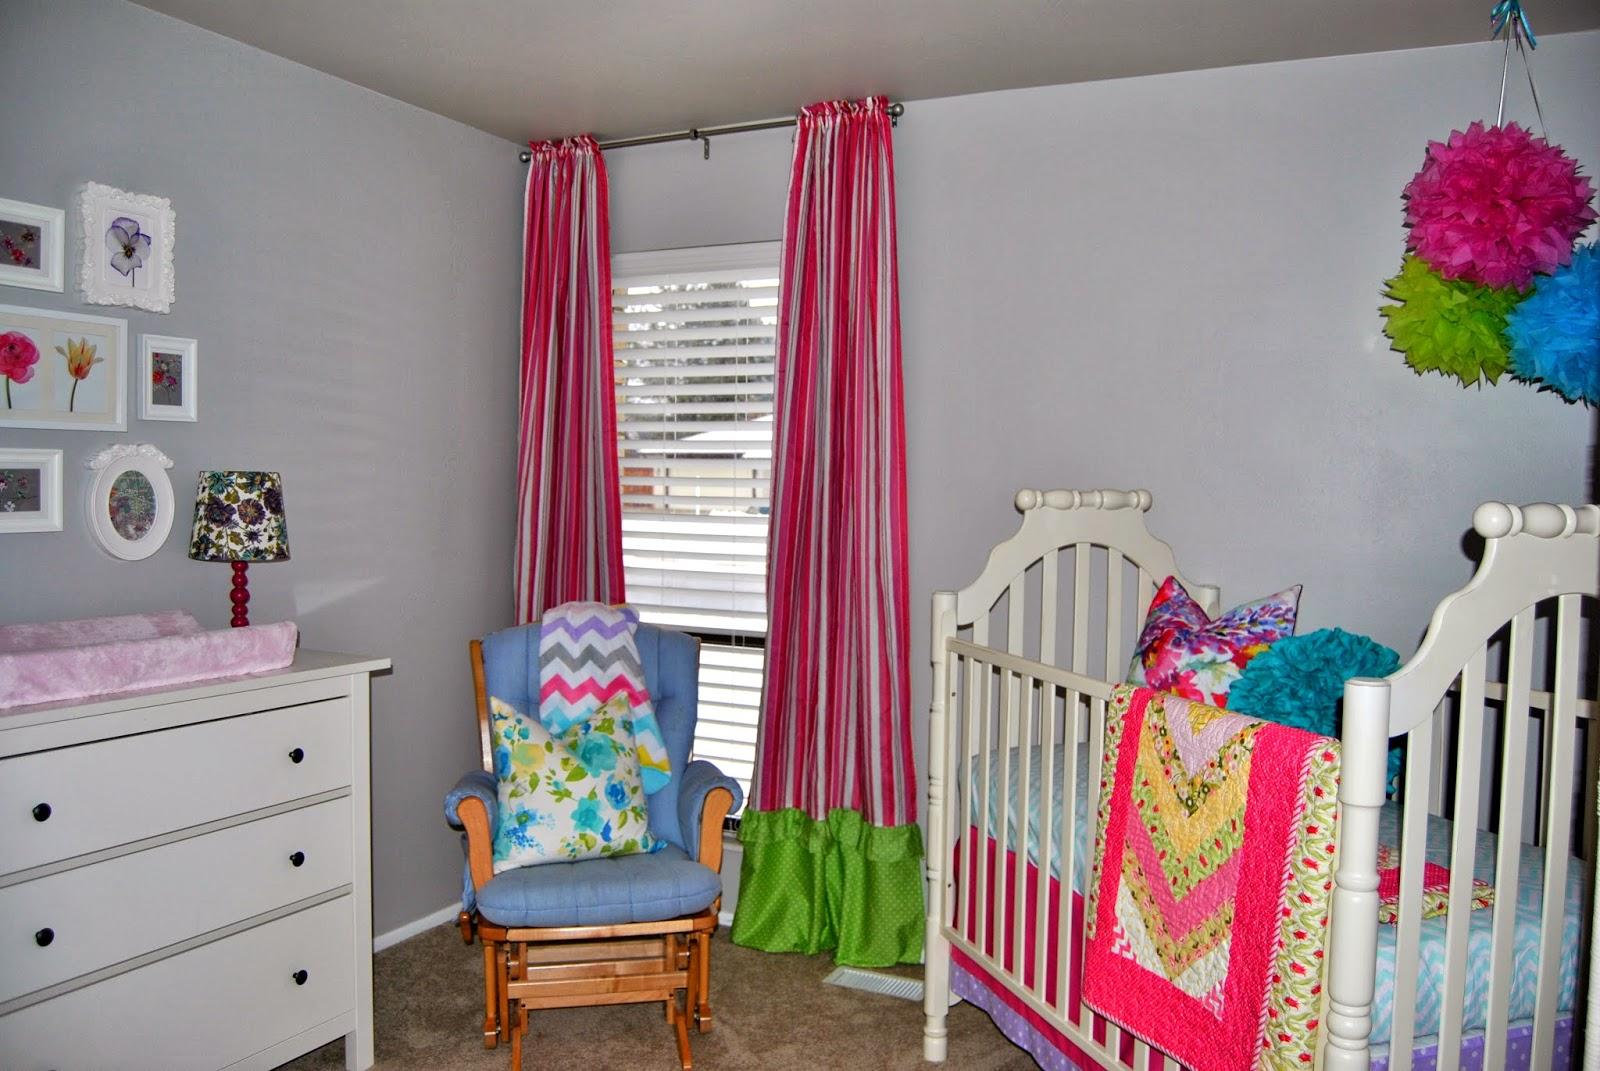 Studio 7 Interior Design Client Reveal Colorful Nursery